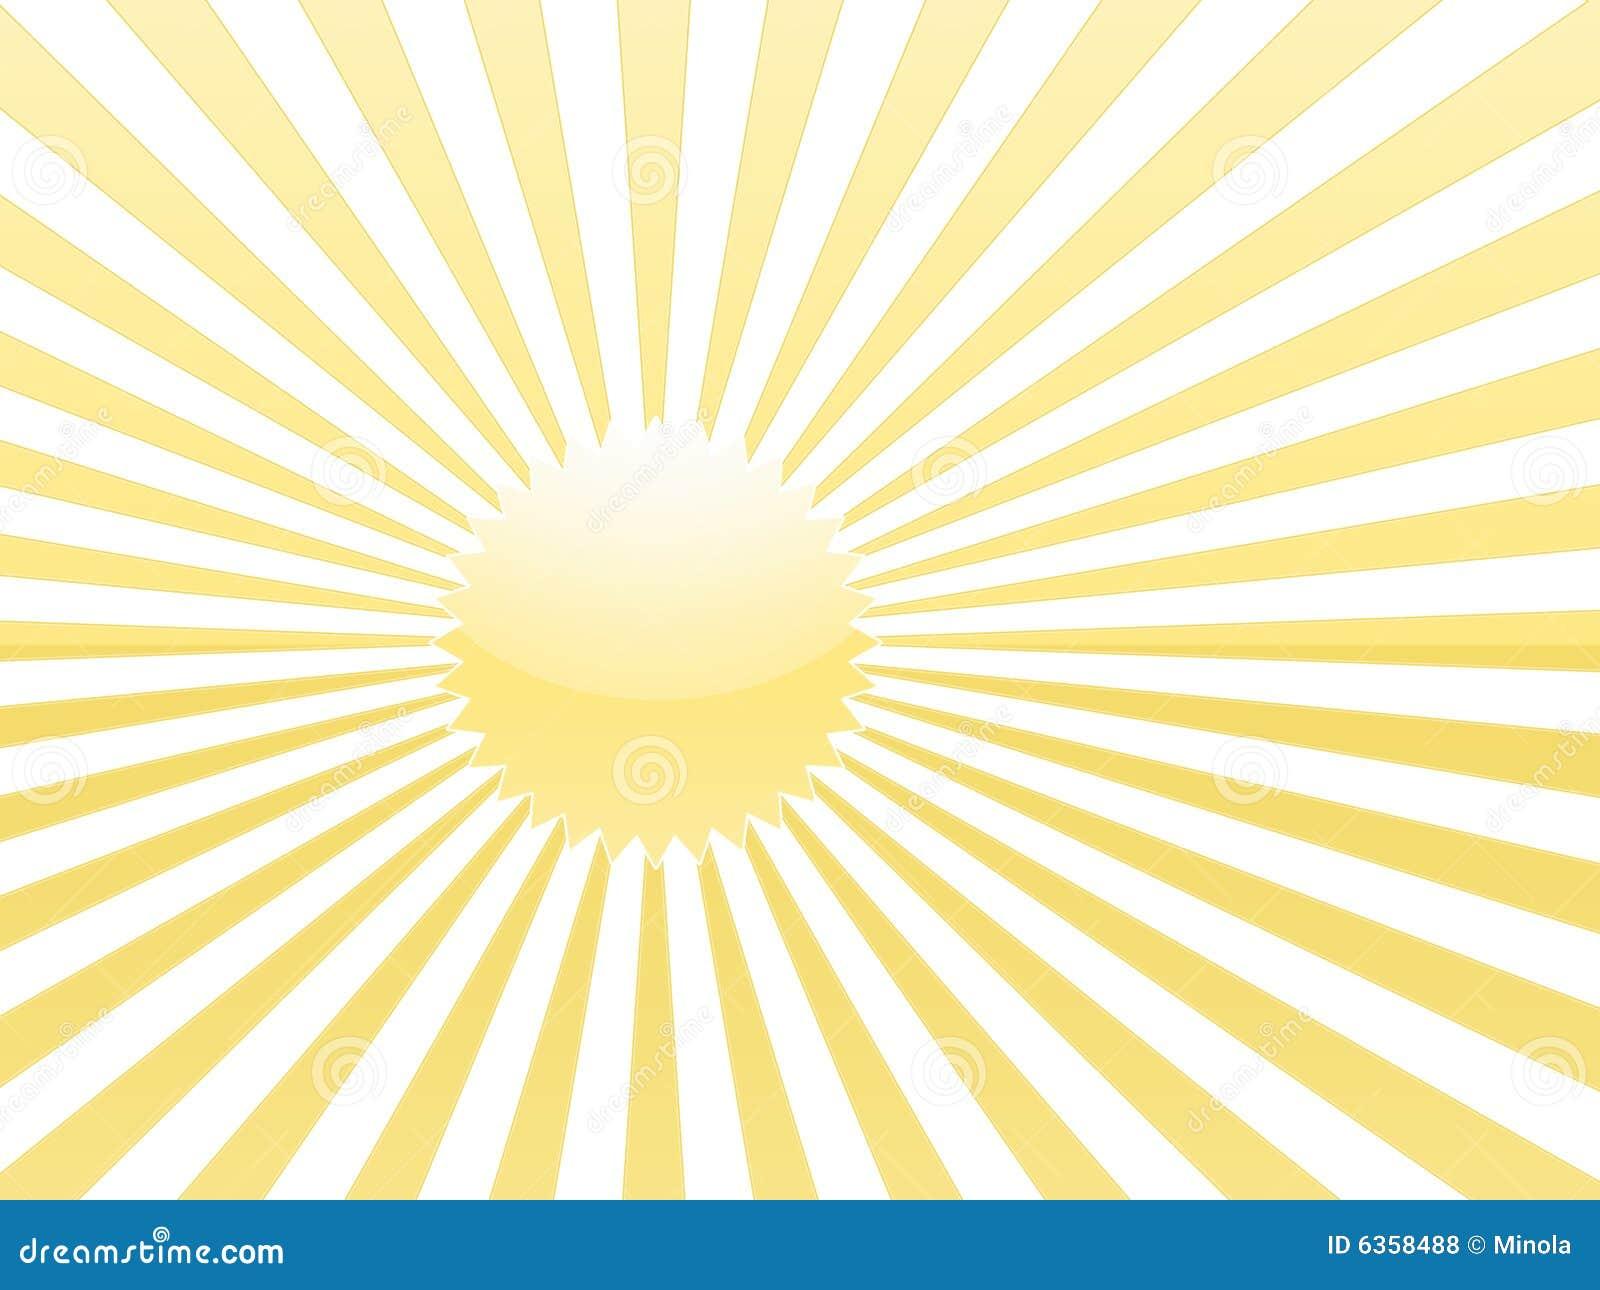 Yellow Sun Rays Royalty Free Stock Photos - Image: 6358488